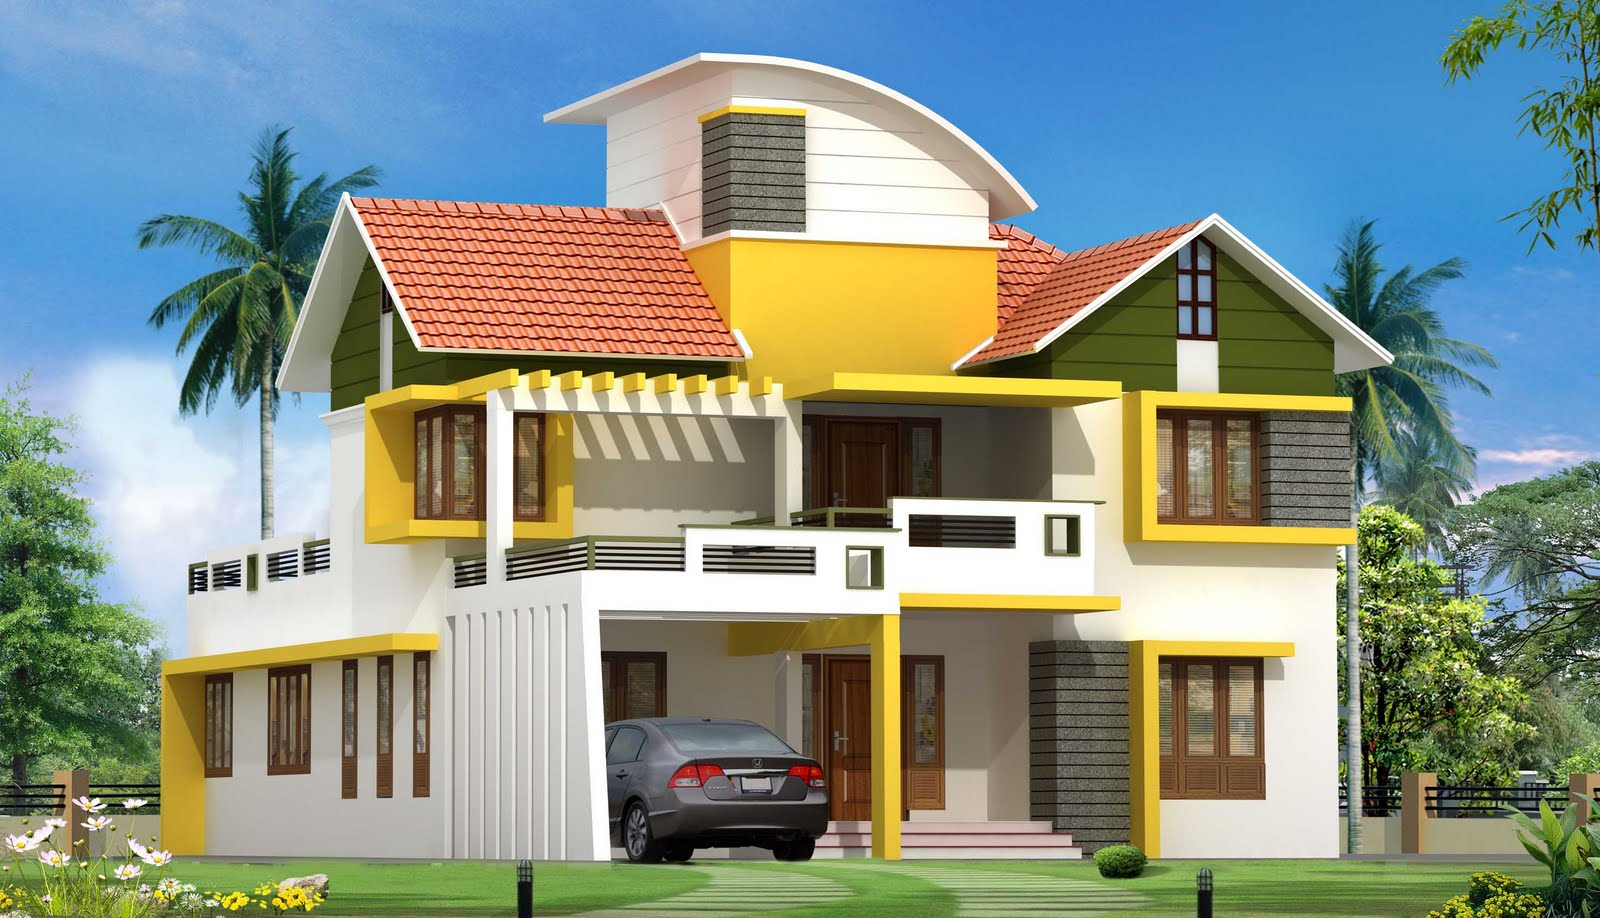 Modern+Kerala+Home+Design+and+2563+Sqft+Floor+plan.jpg